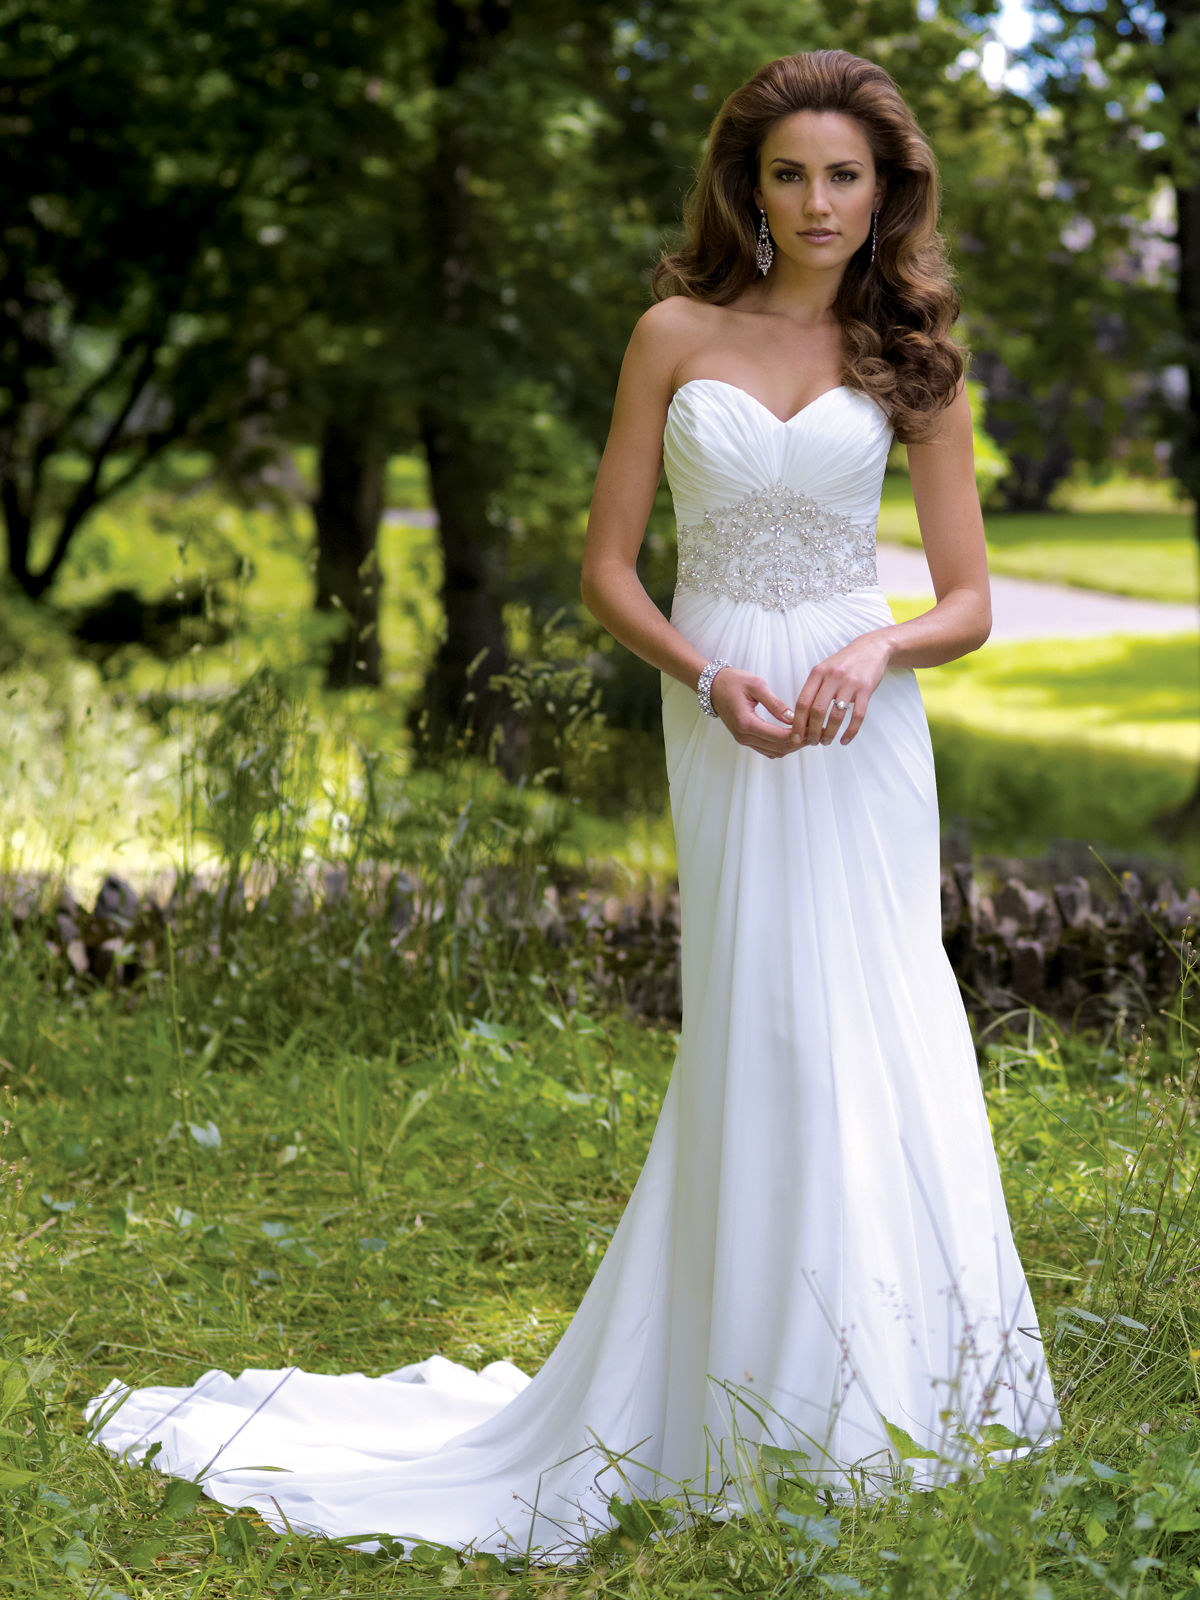 casual wedding dresses casual wedding dresses Wedding Dresses Casual